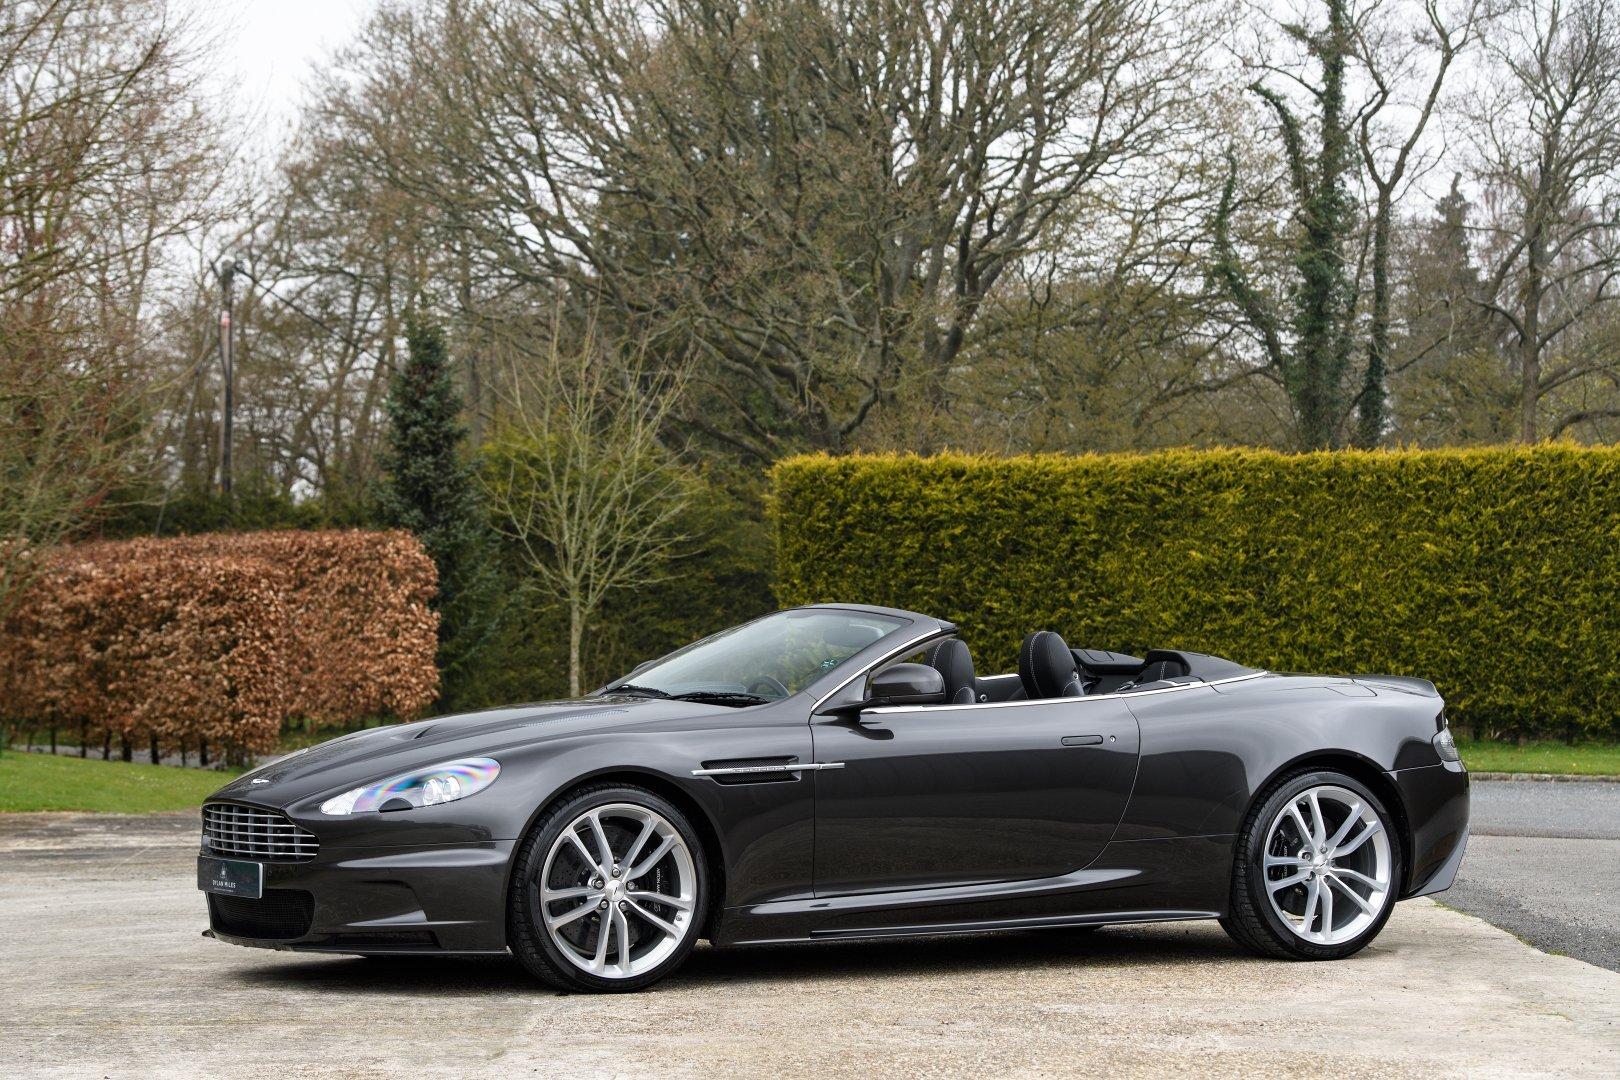 2011 Aston Martin DBS Volante  For Sale (picture 1 of 6)